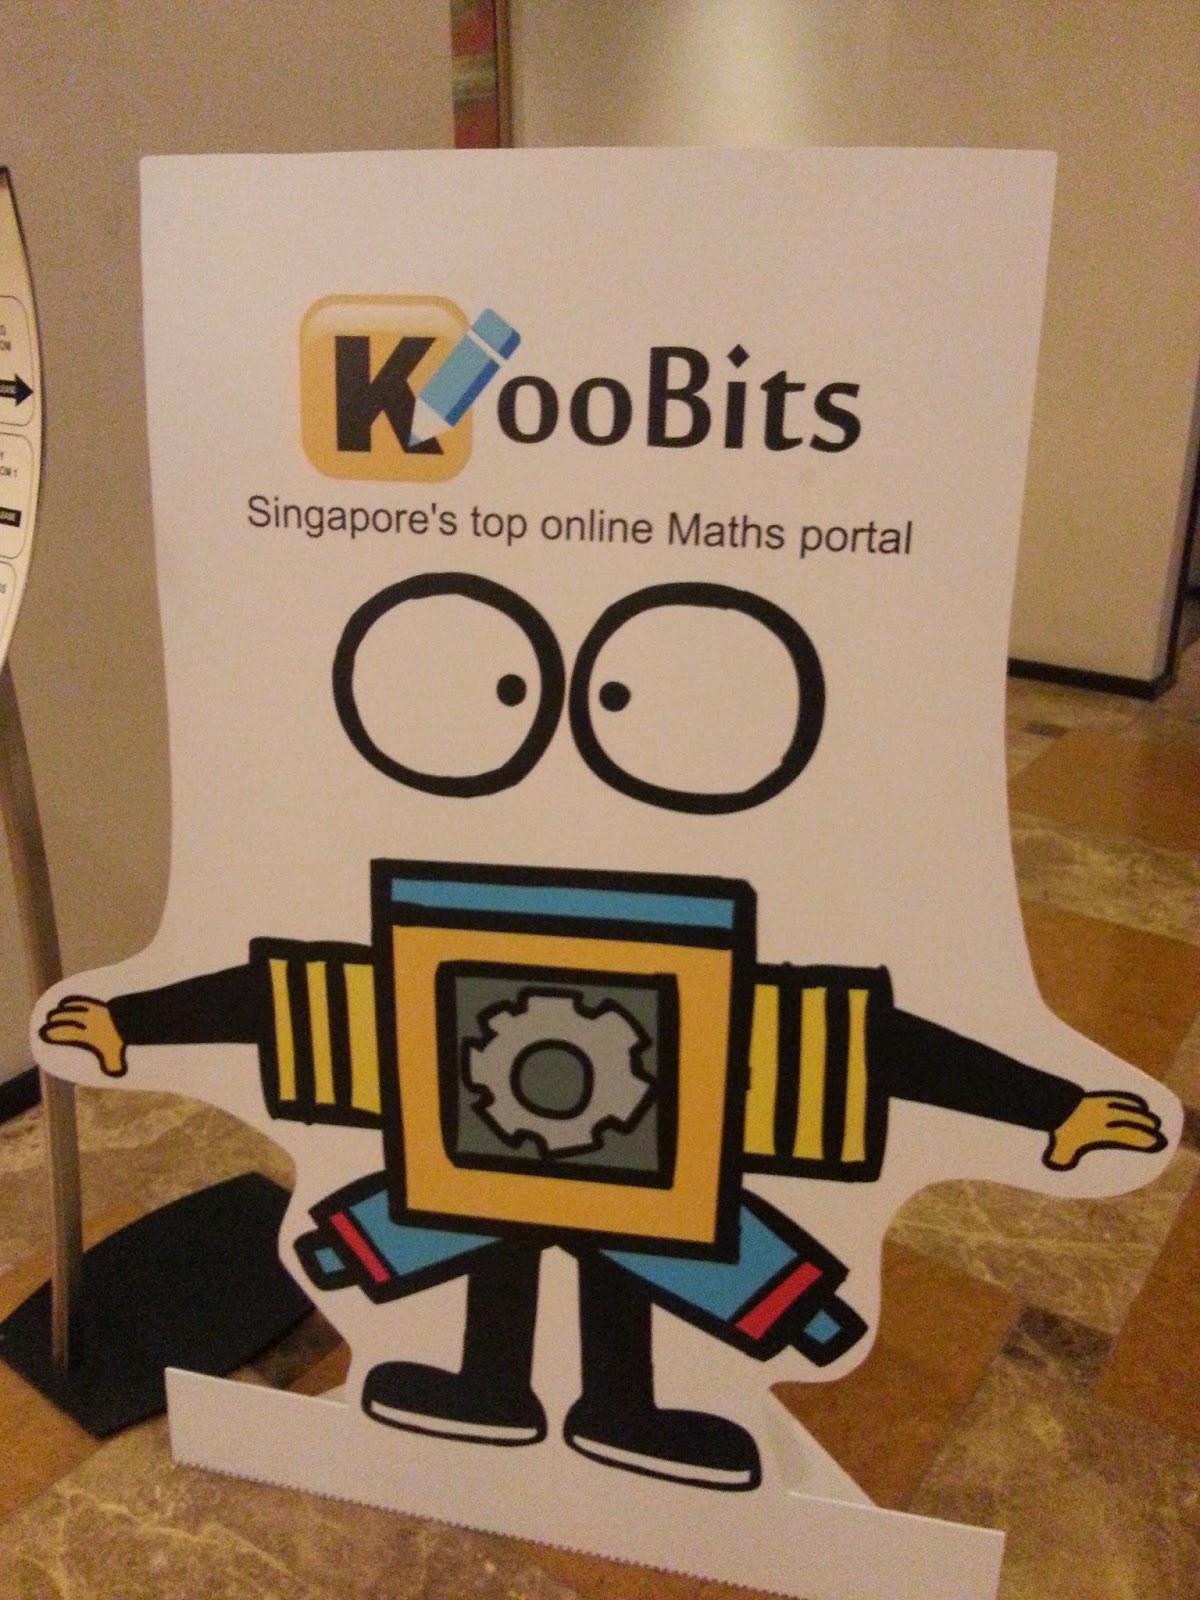 Shopgirl Jen: KooBits Maths Online Portal is now in the Philippines